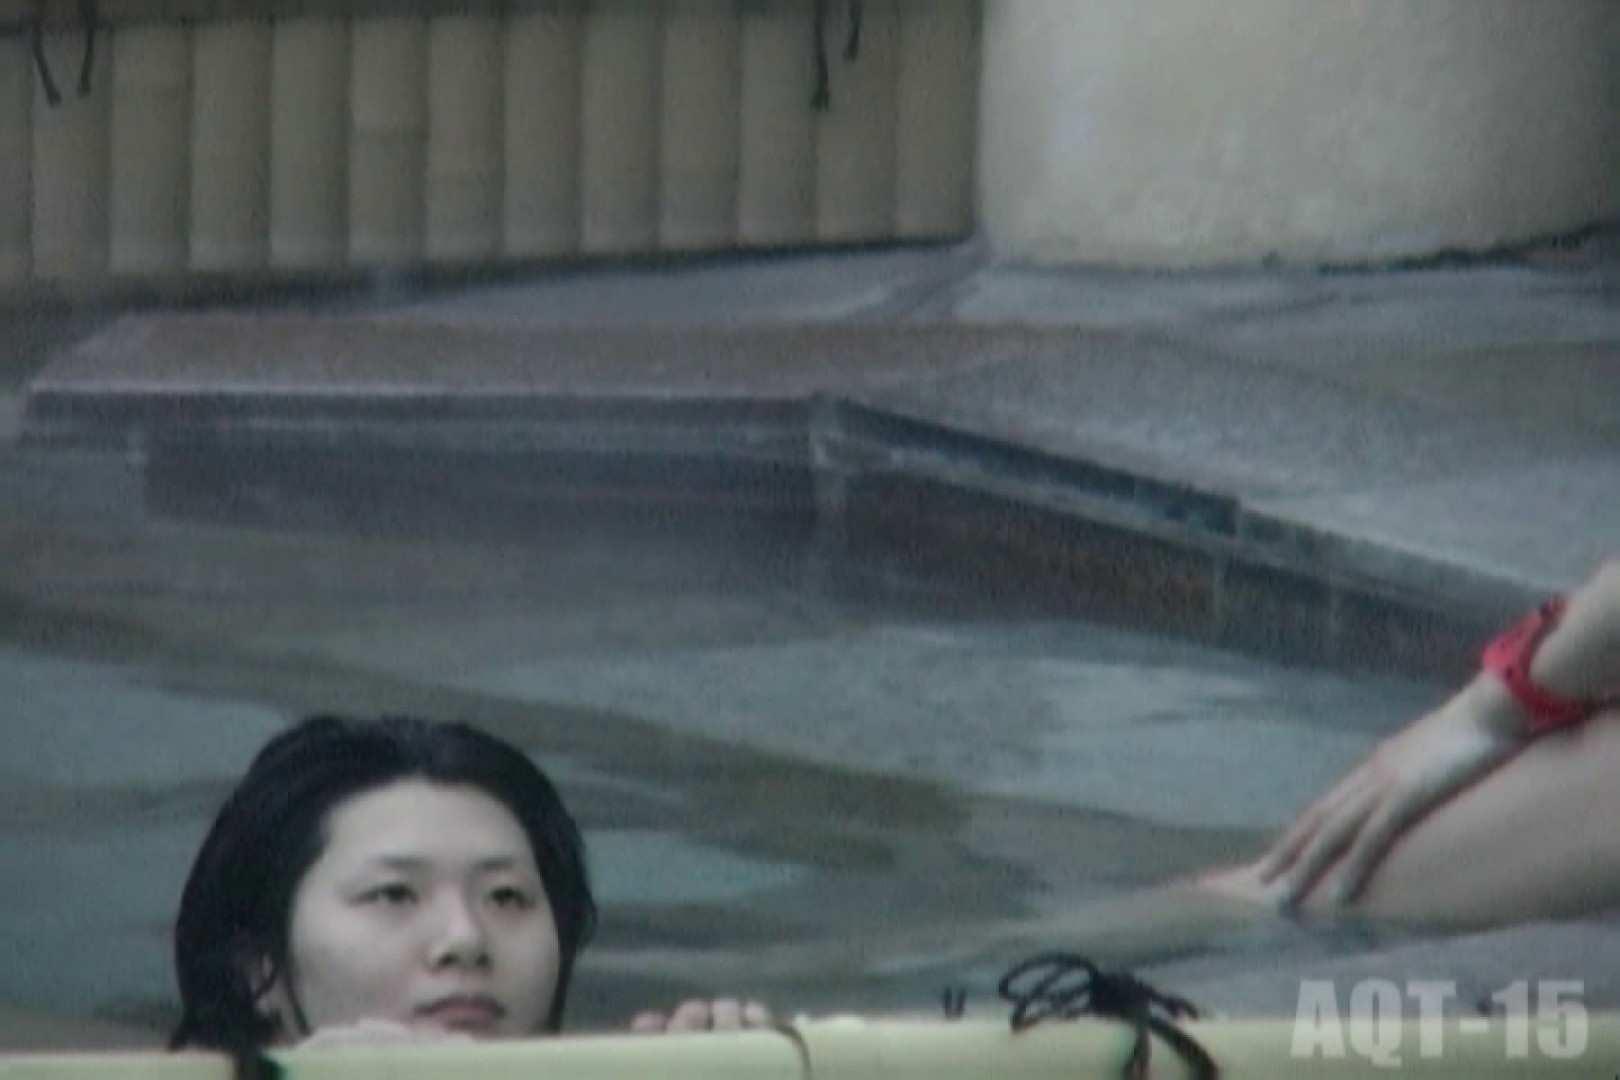 Aquaな露天風呂Vol.837 盗撮シリーズ   露天風呂編  106PIX 57